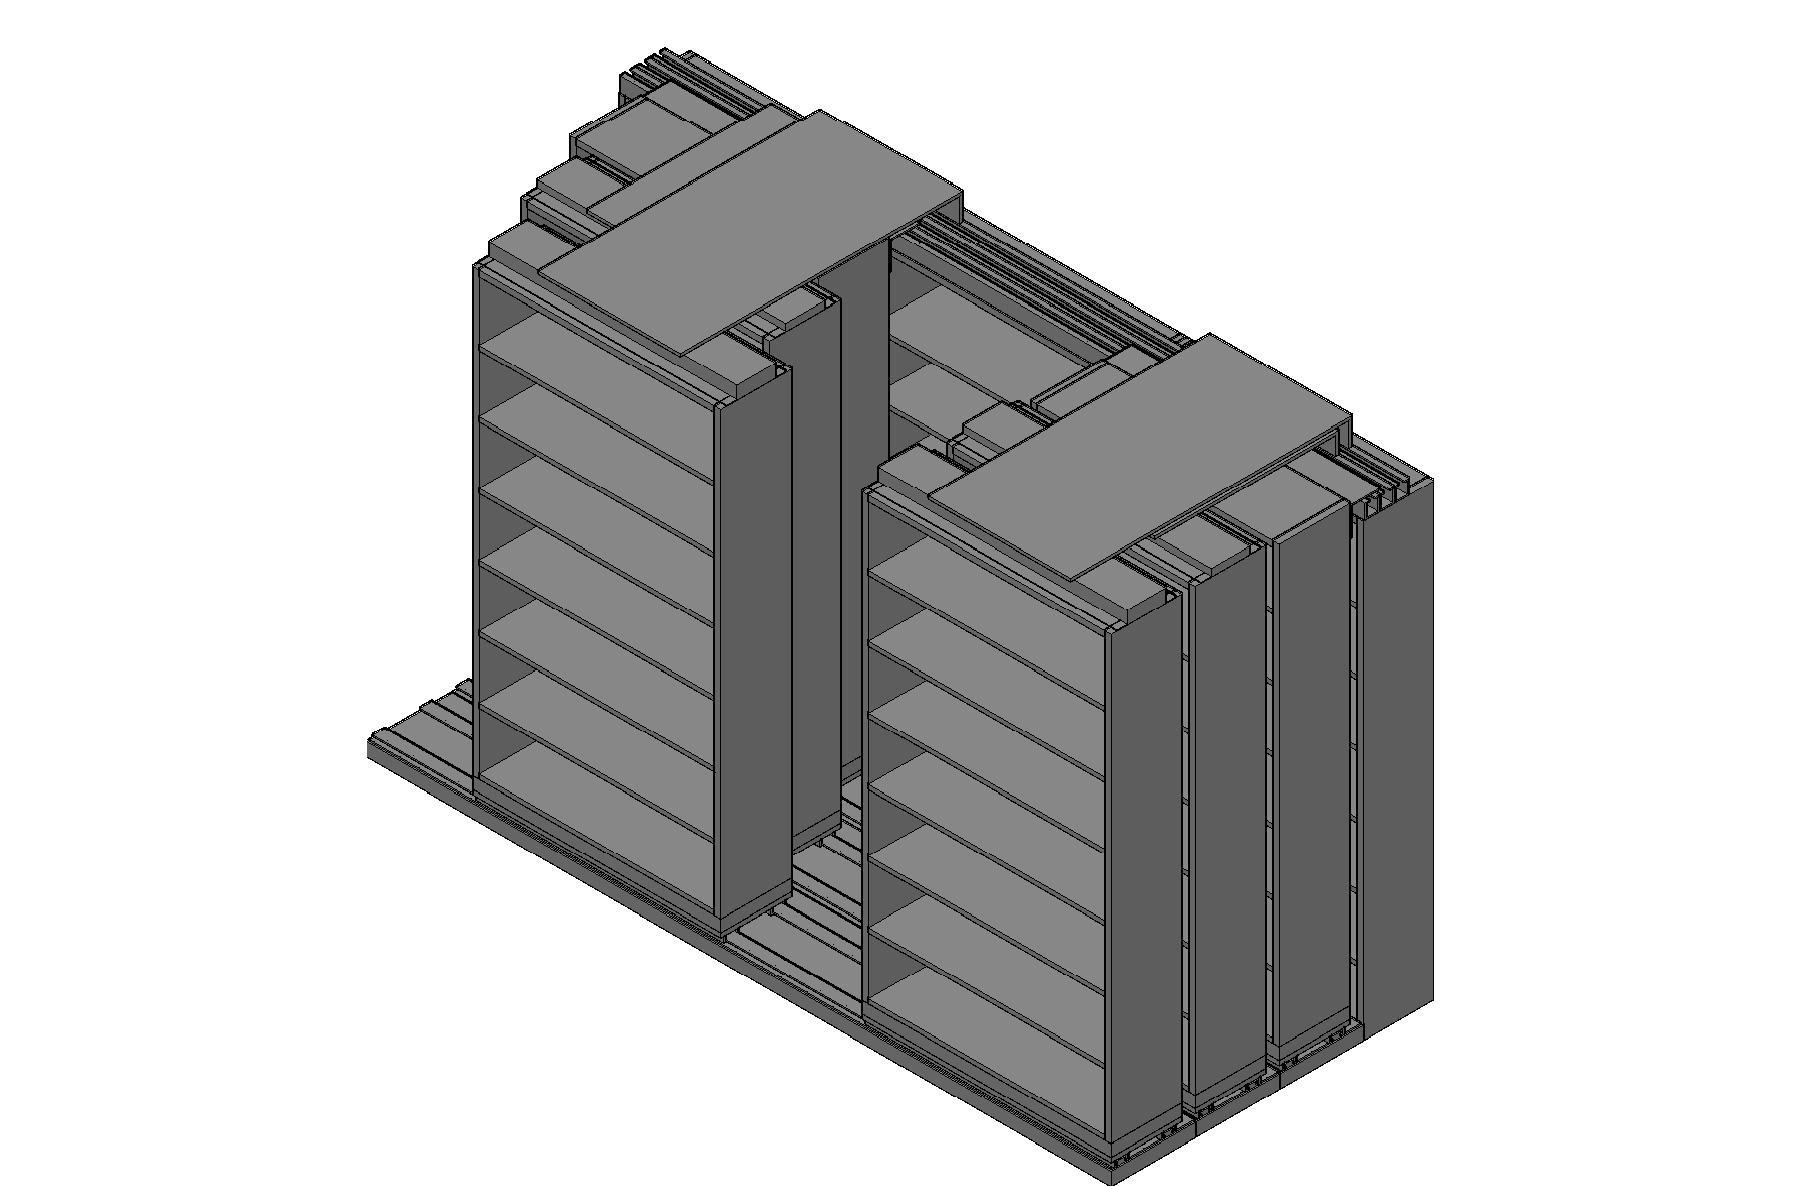 "Letter Size Sliding Shelves - 4 Rows Deep - 7 Levels - (42"" x 12"" Shelves) - 130"" Total Width"